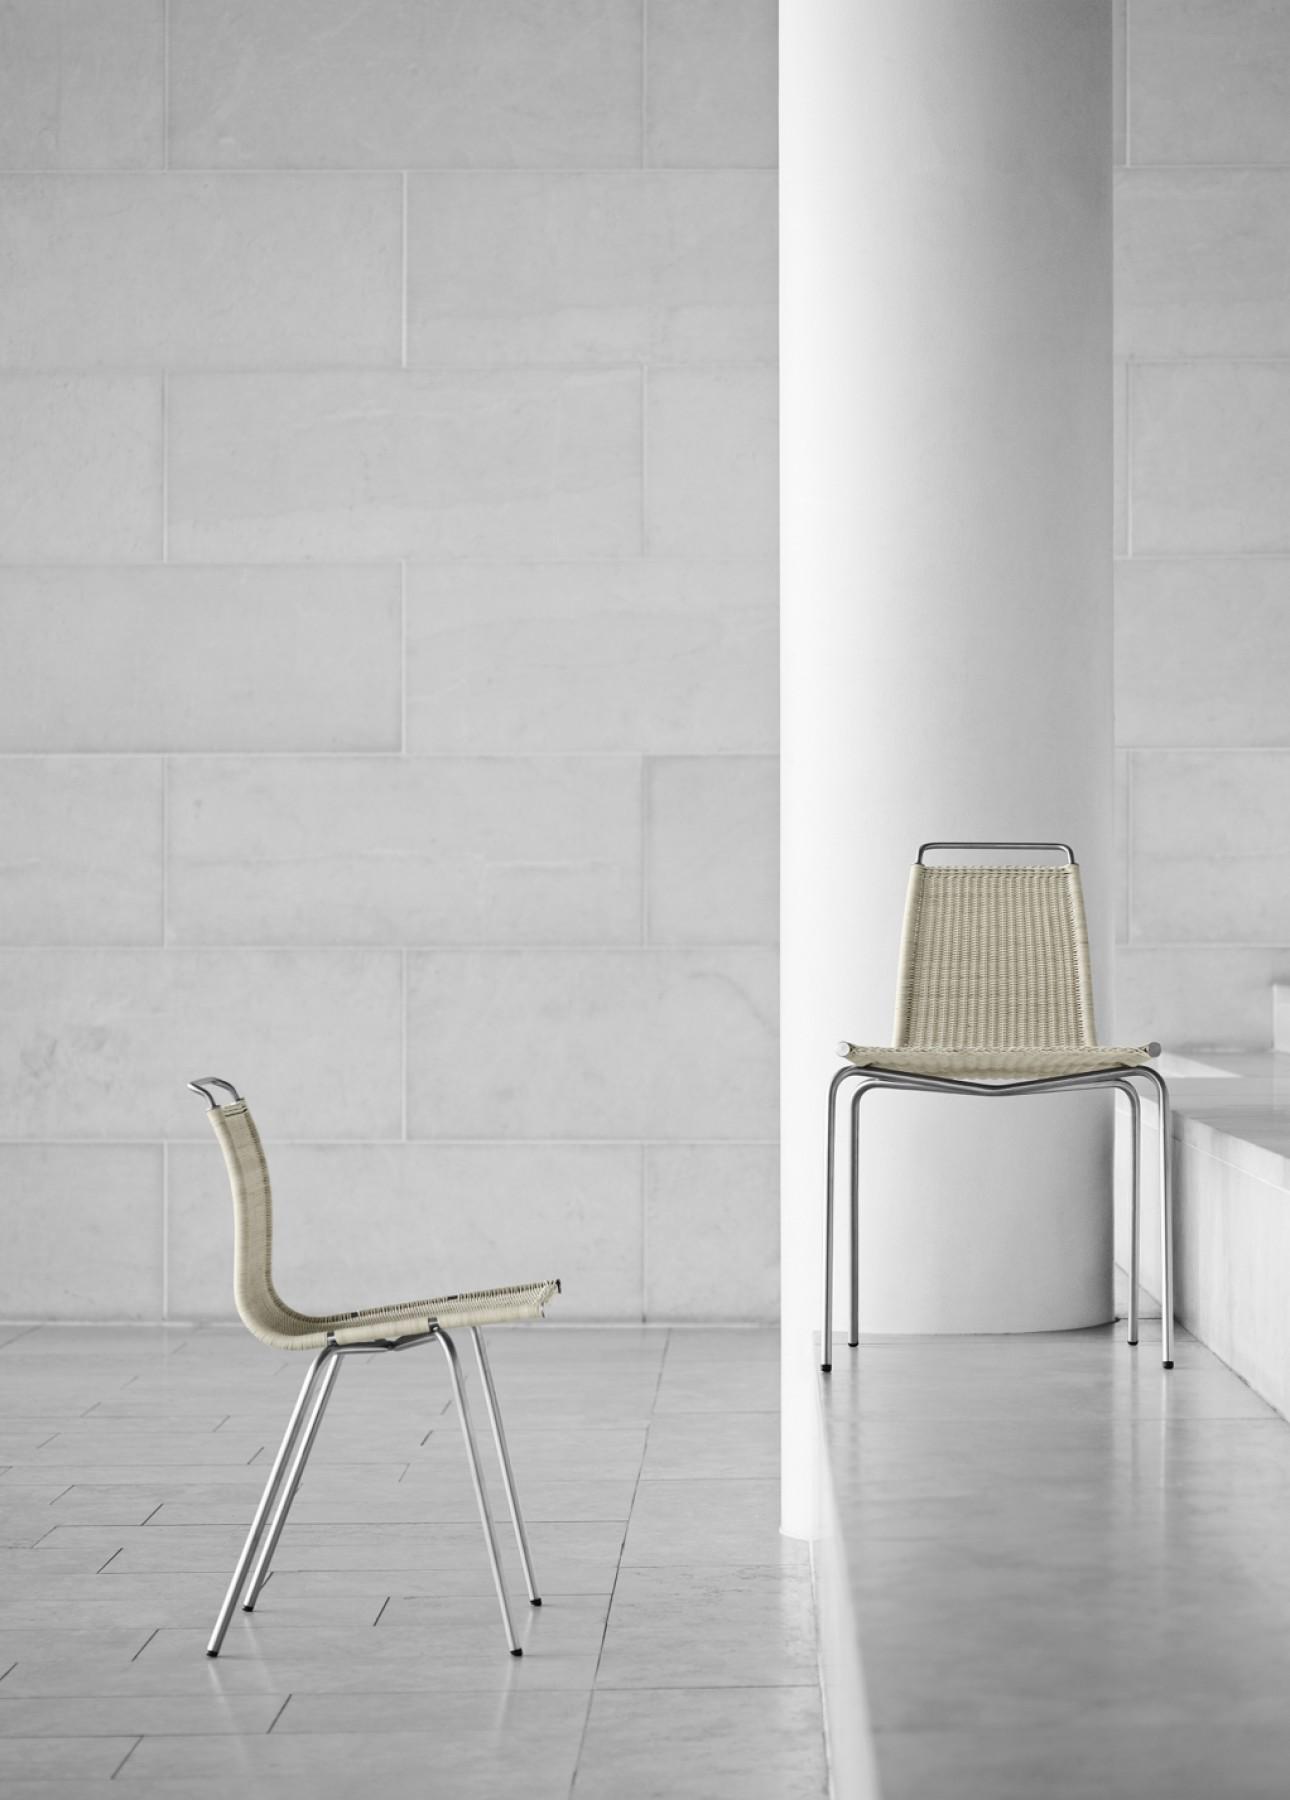 Wicker Chair PK01 Poul Kjaerholm, design 1955